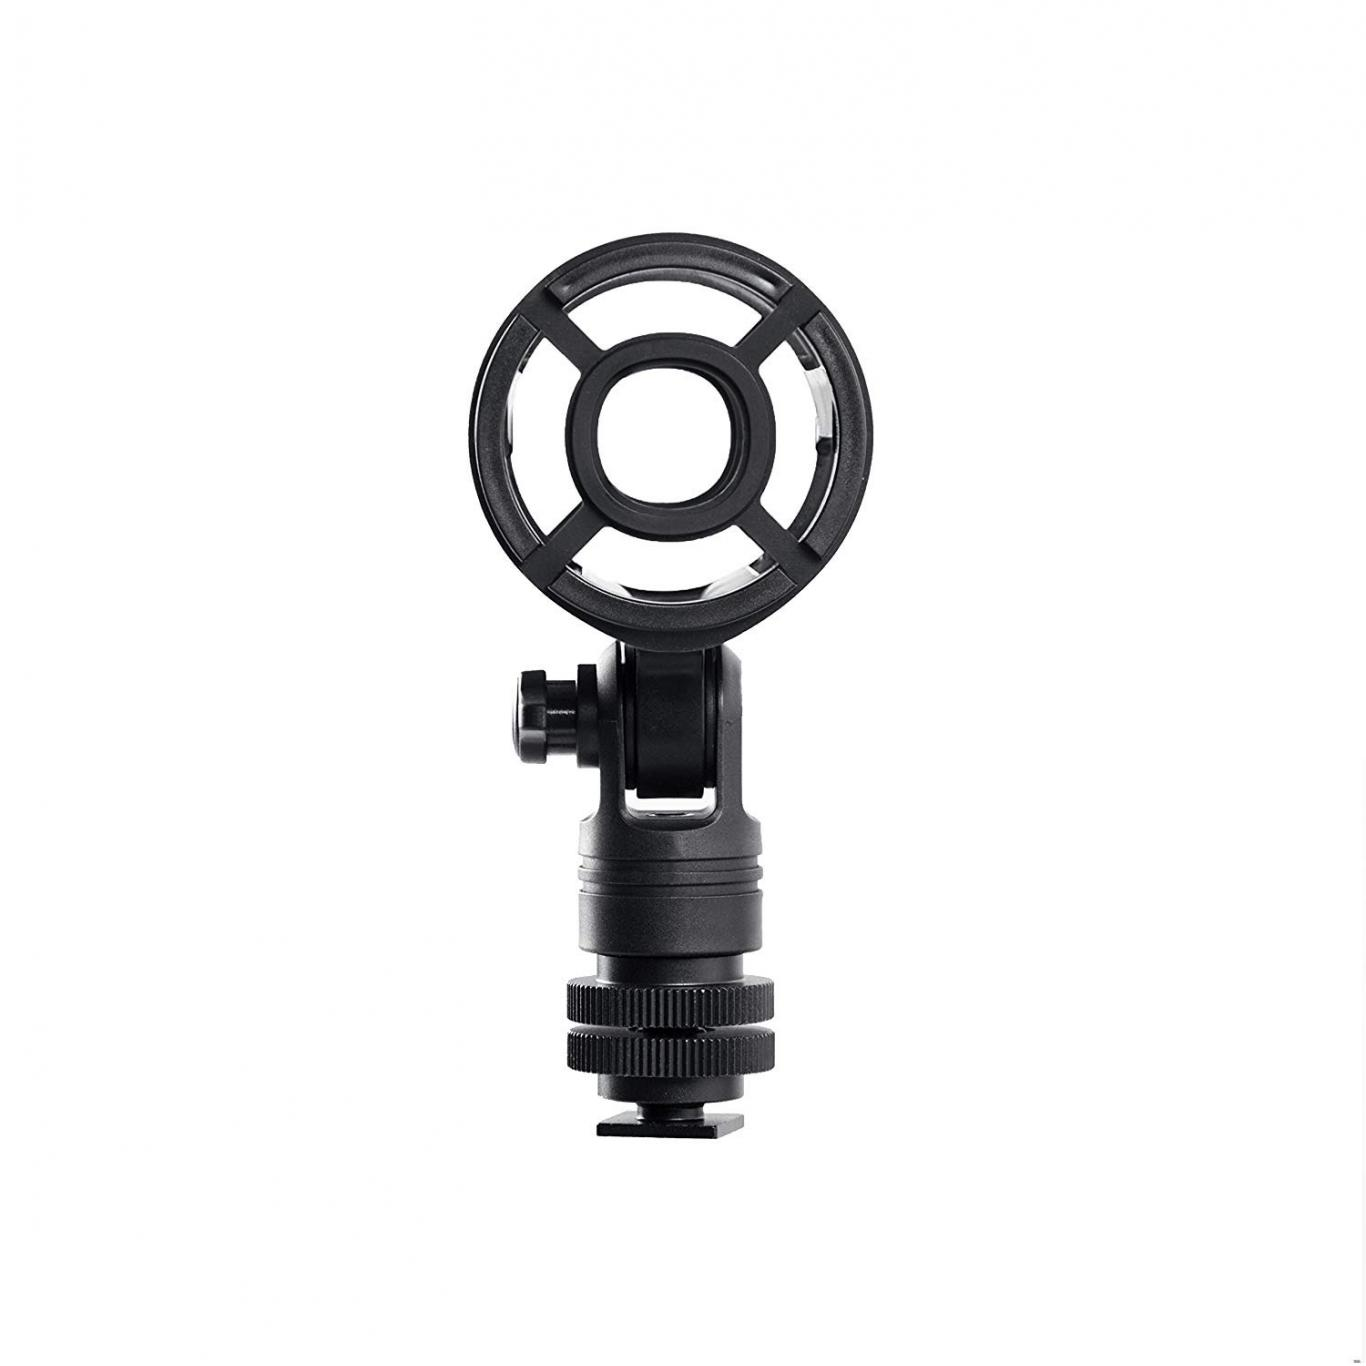 aramonic SR-SMC2 Shotgun Microphone Shockmount